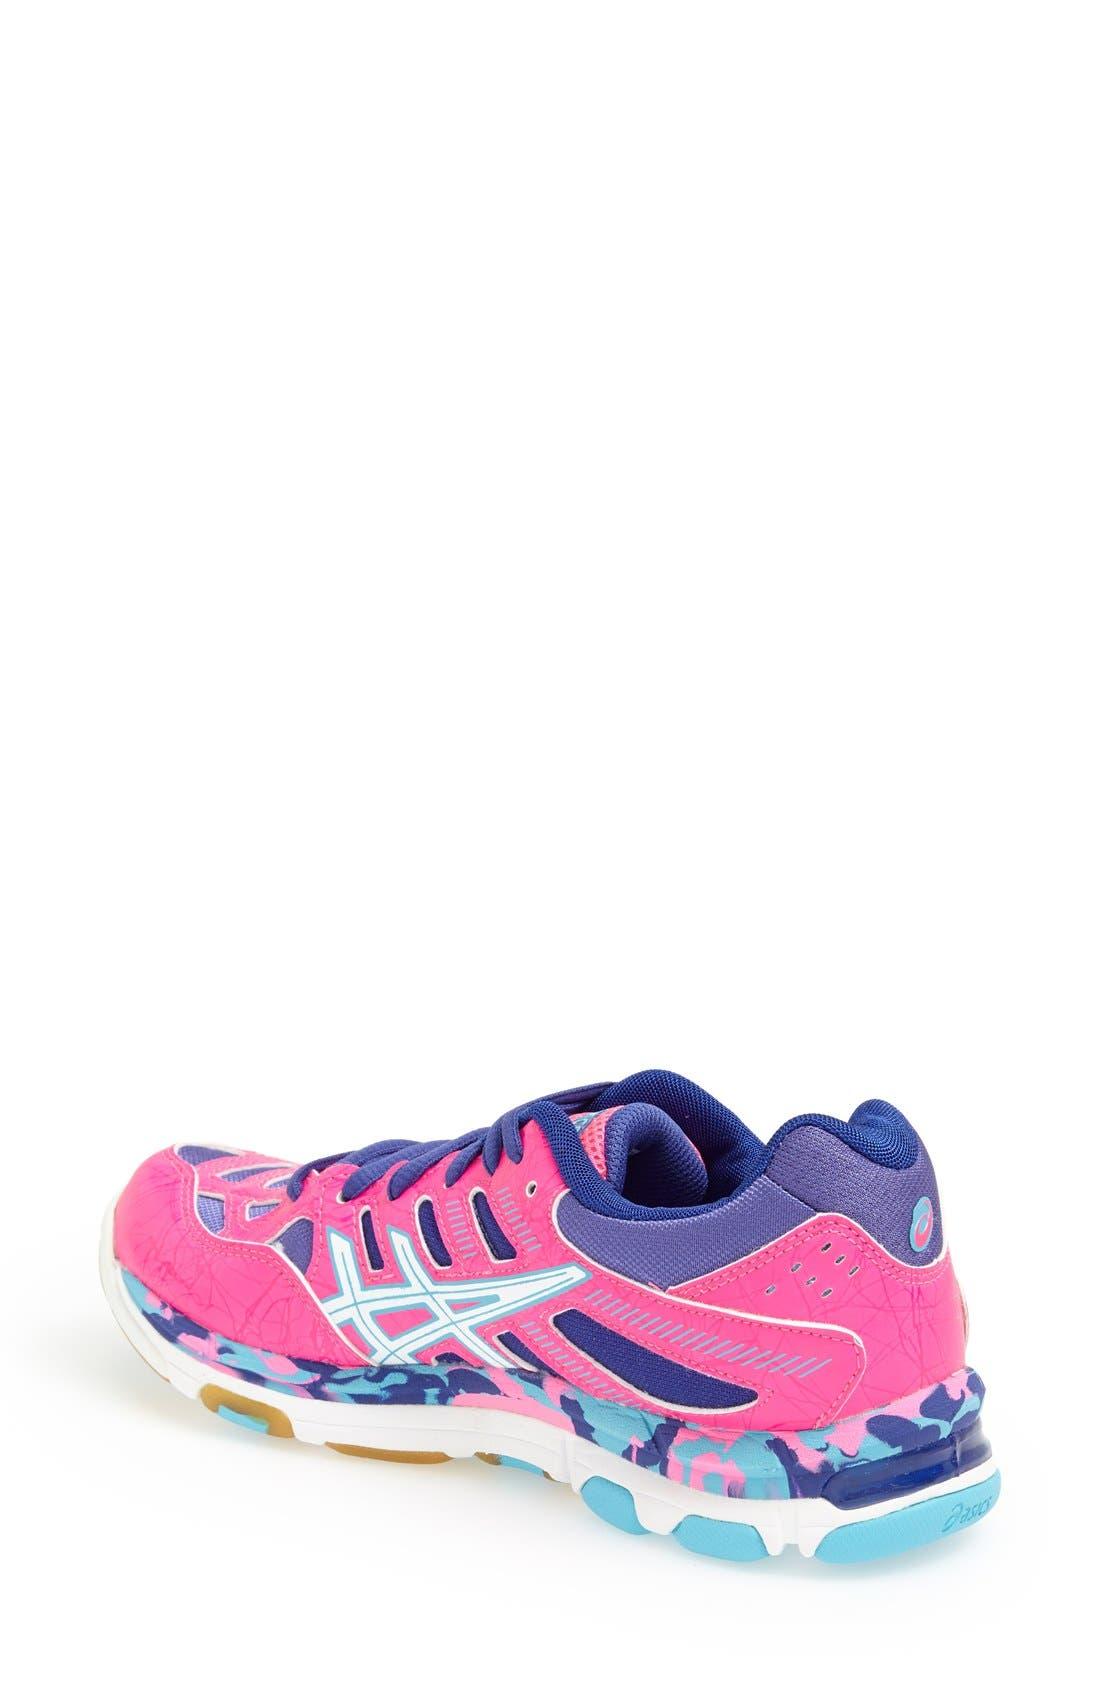 Alternate Image 2  - ASICS® 'GEL-Volleycross® Revolution' Volleyball Shoe (Women) (Regular Retail Price: 109.95)